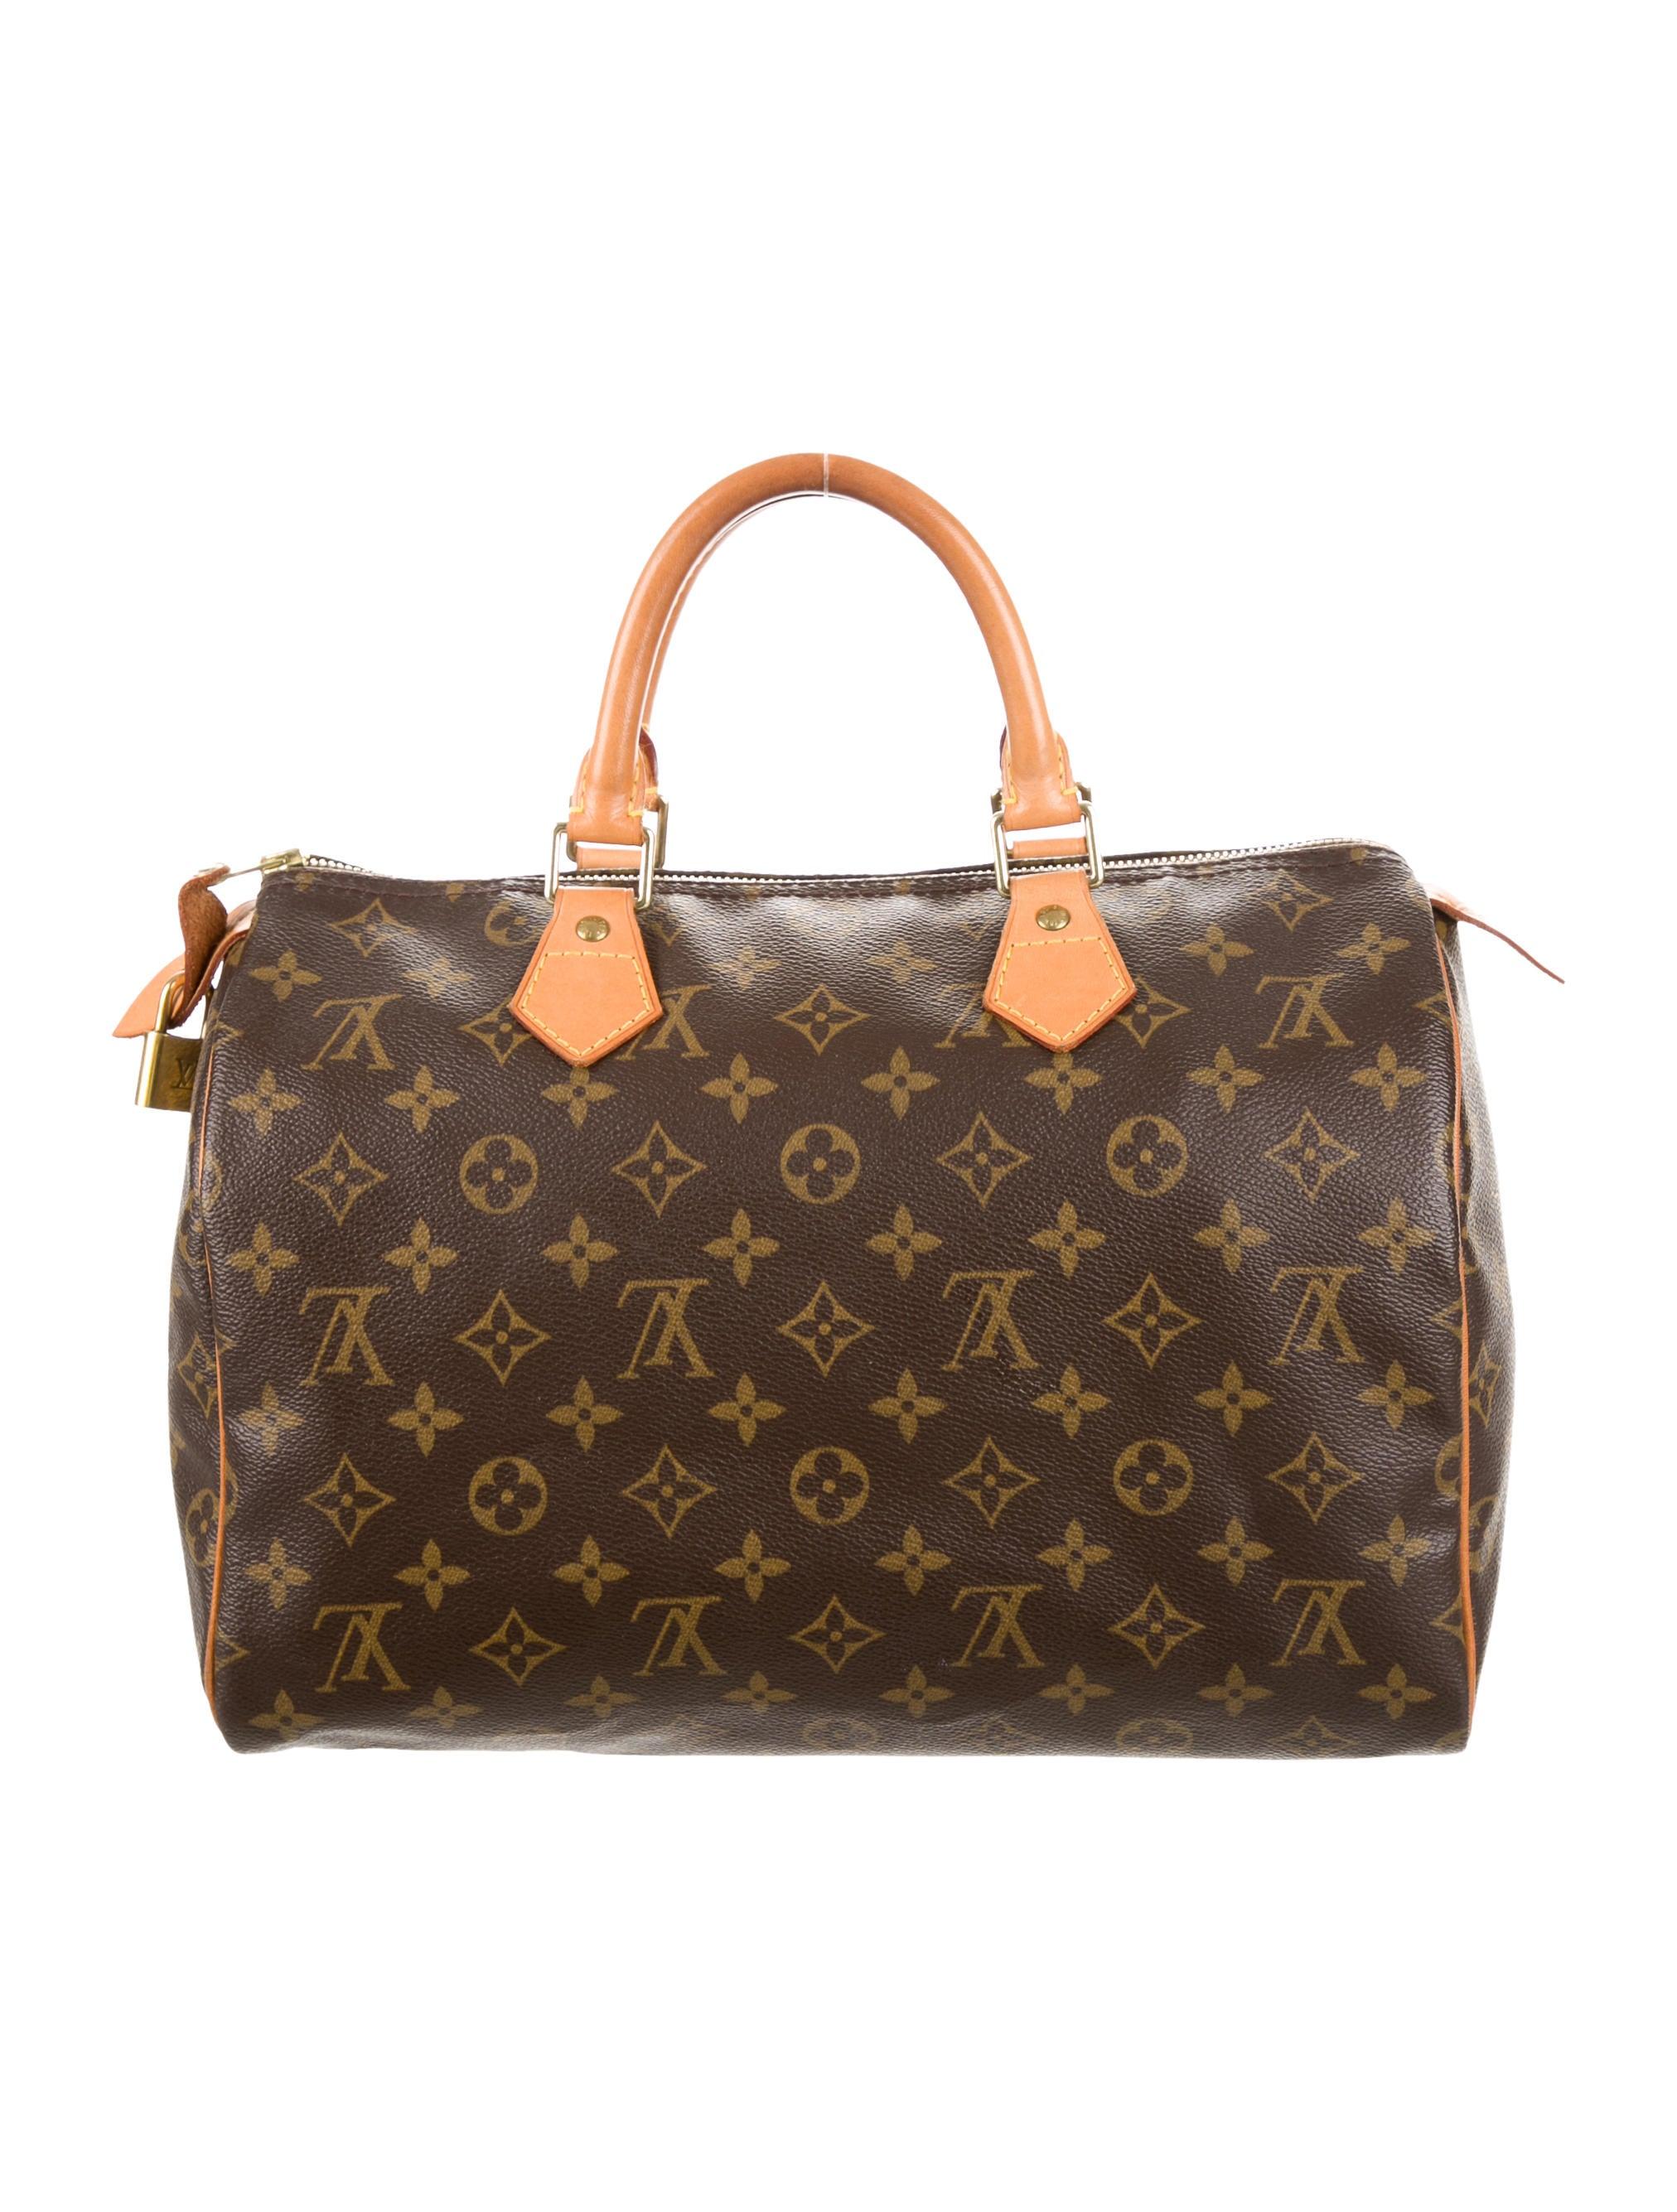 louis vuitton monogram speedy 30 handbags lou105992. Black Bedroom Furniture Sets. Home Design Ideas